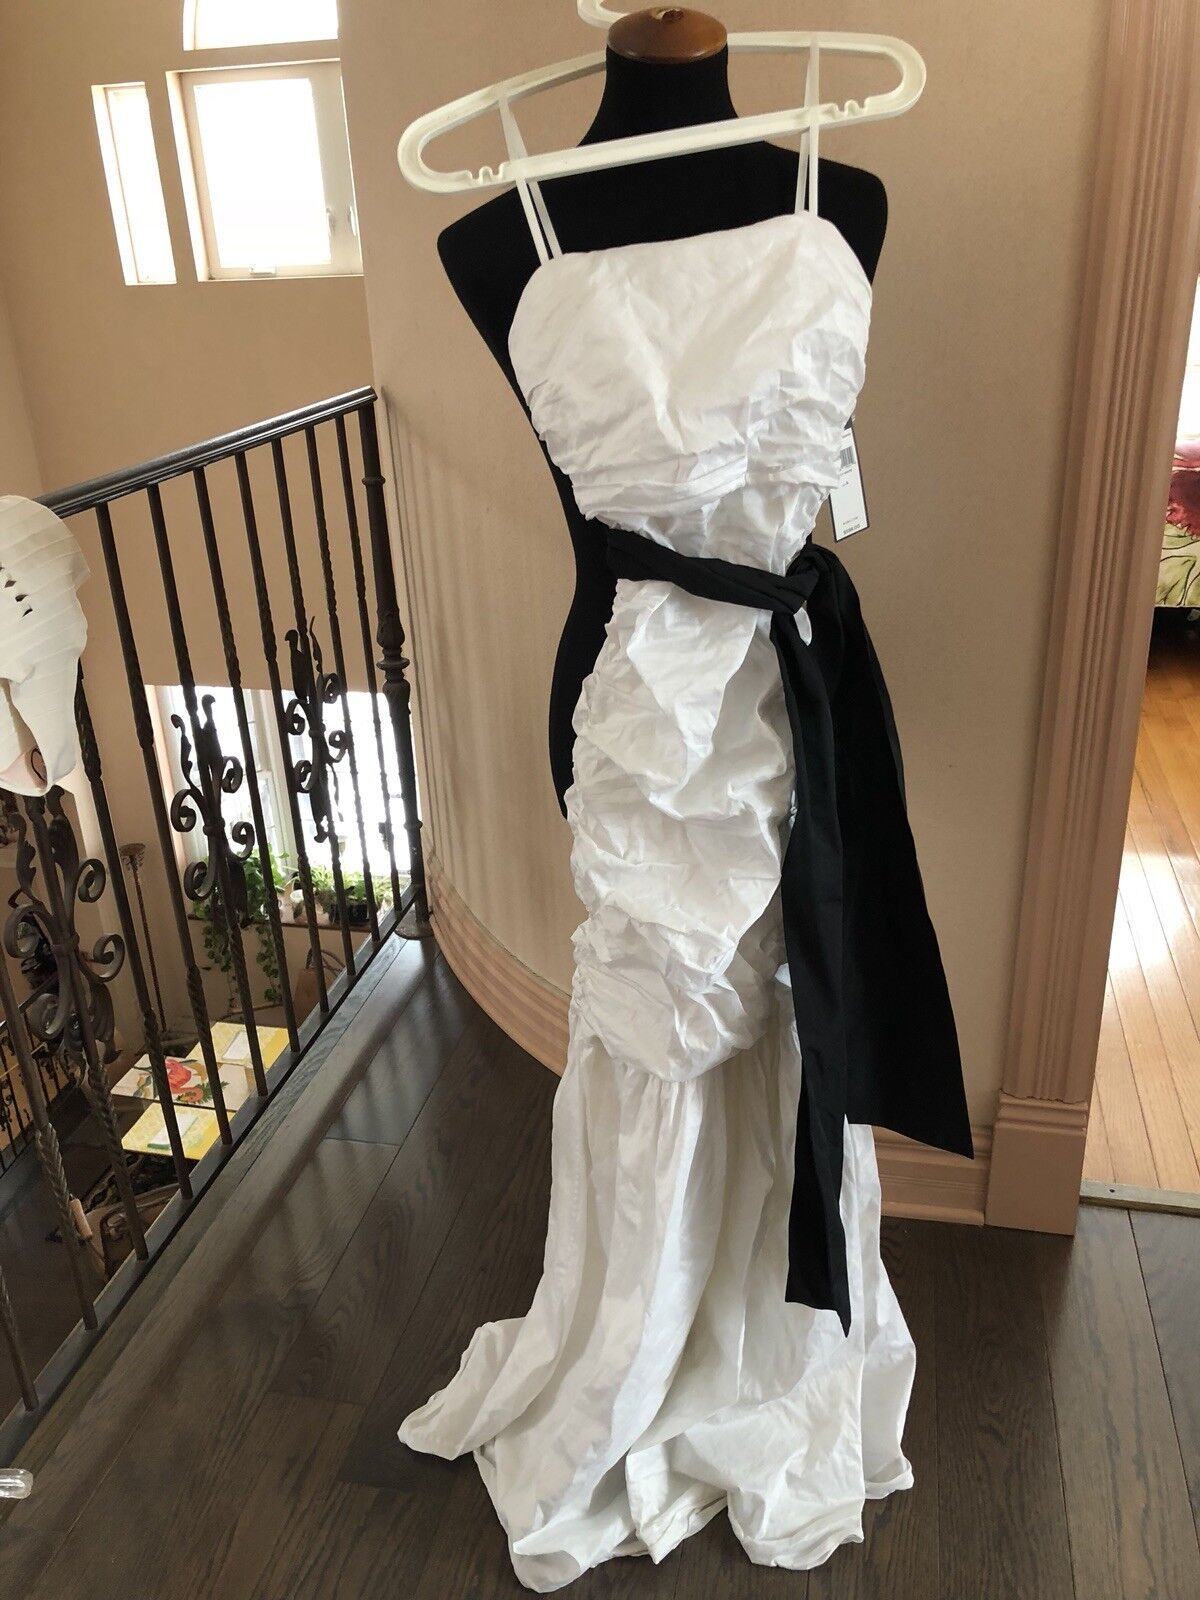 NWT white dress bcbg dress 0 (small)